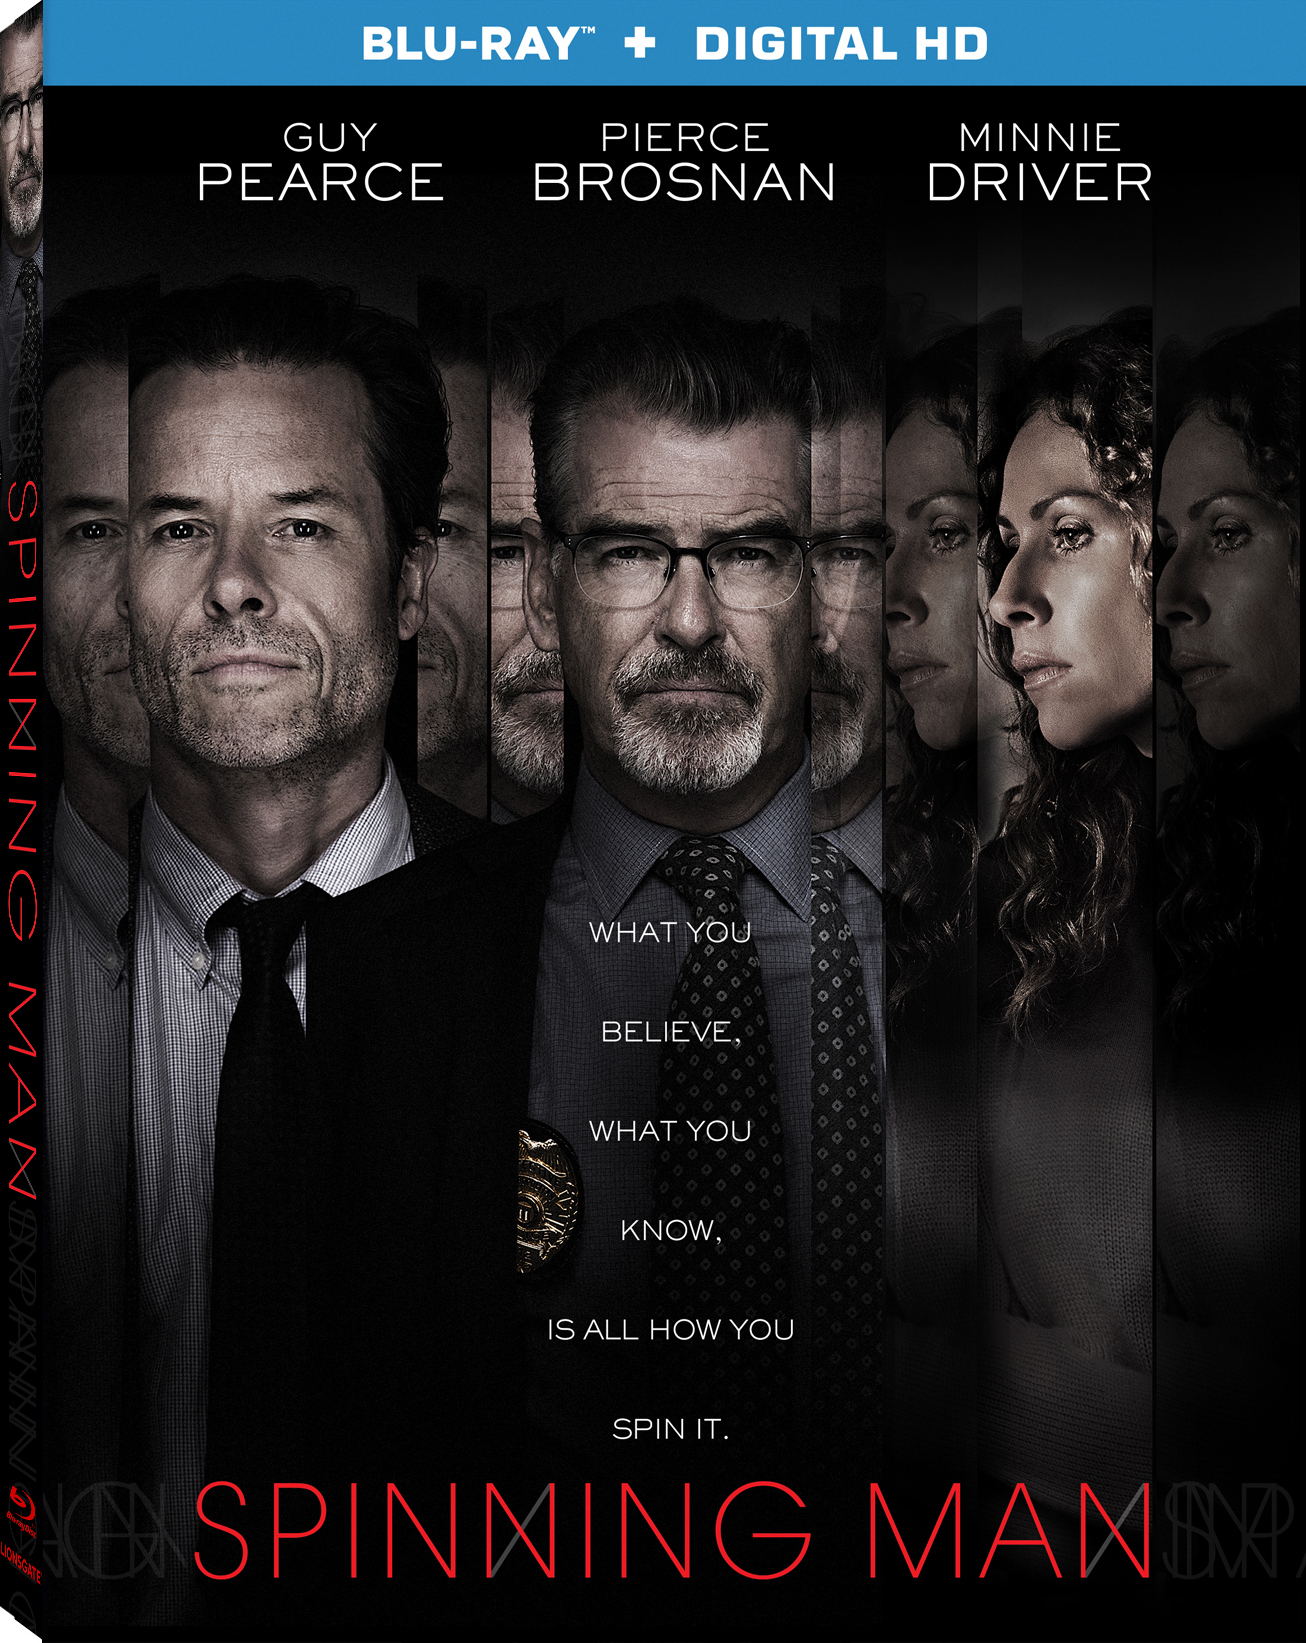 Spinning Man (2018) Blu-ray